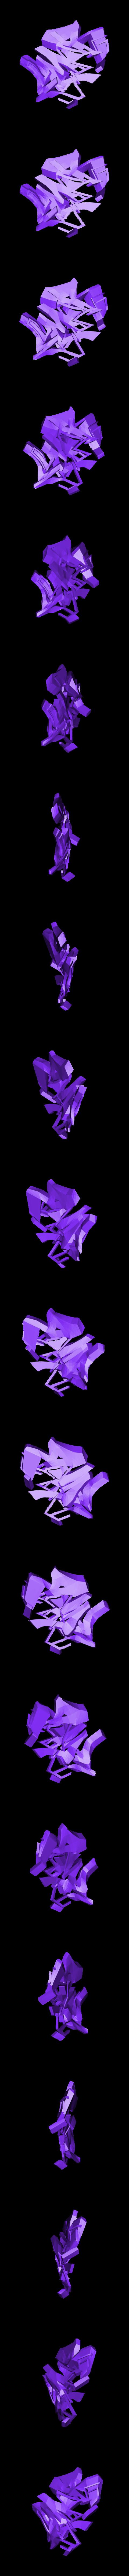 EMOR.stl Télécharger fichier STL gratuit SEMOR • Design imprimable en 3D, NormallyBen